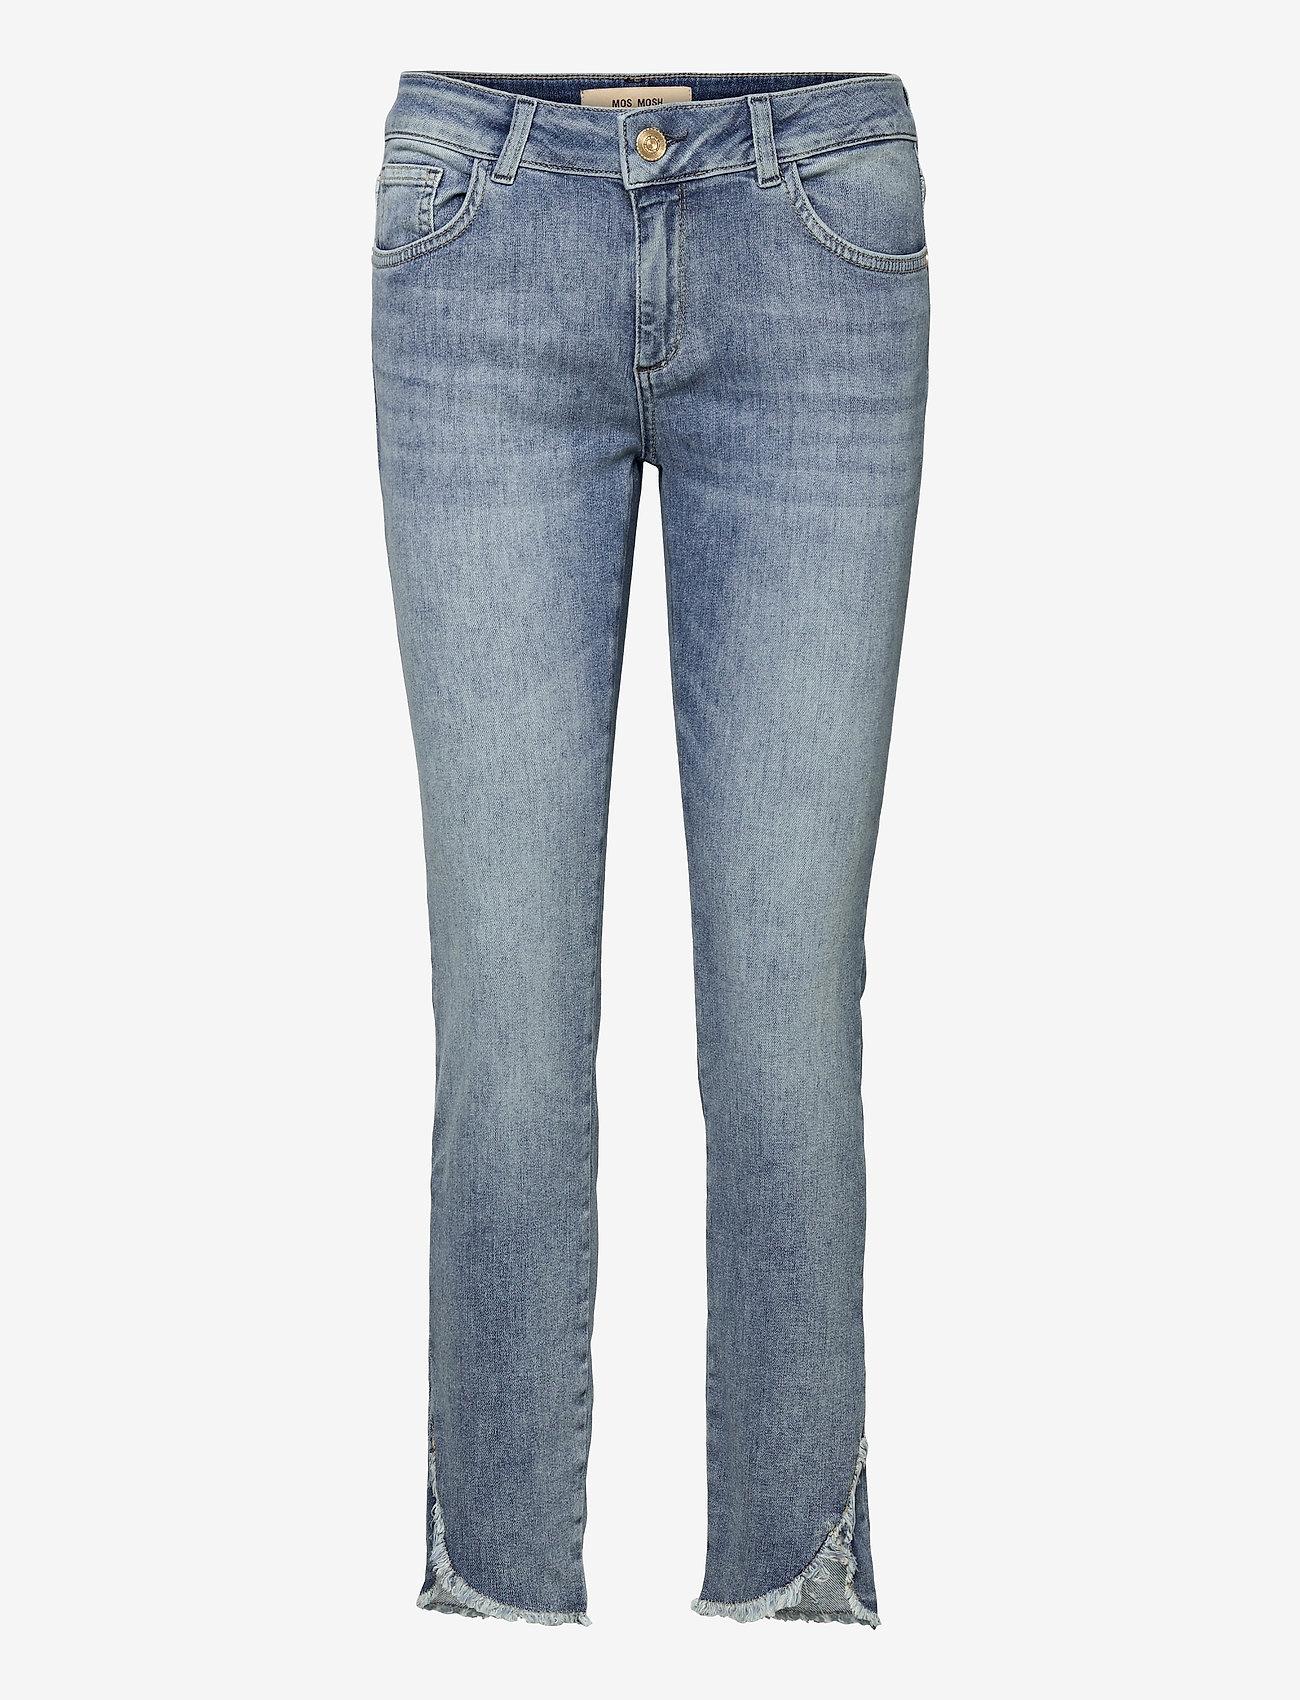 MOS MOSH - Sumner Epic Jeans - slim jeans - light blue - 0